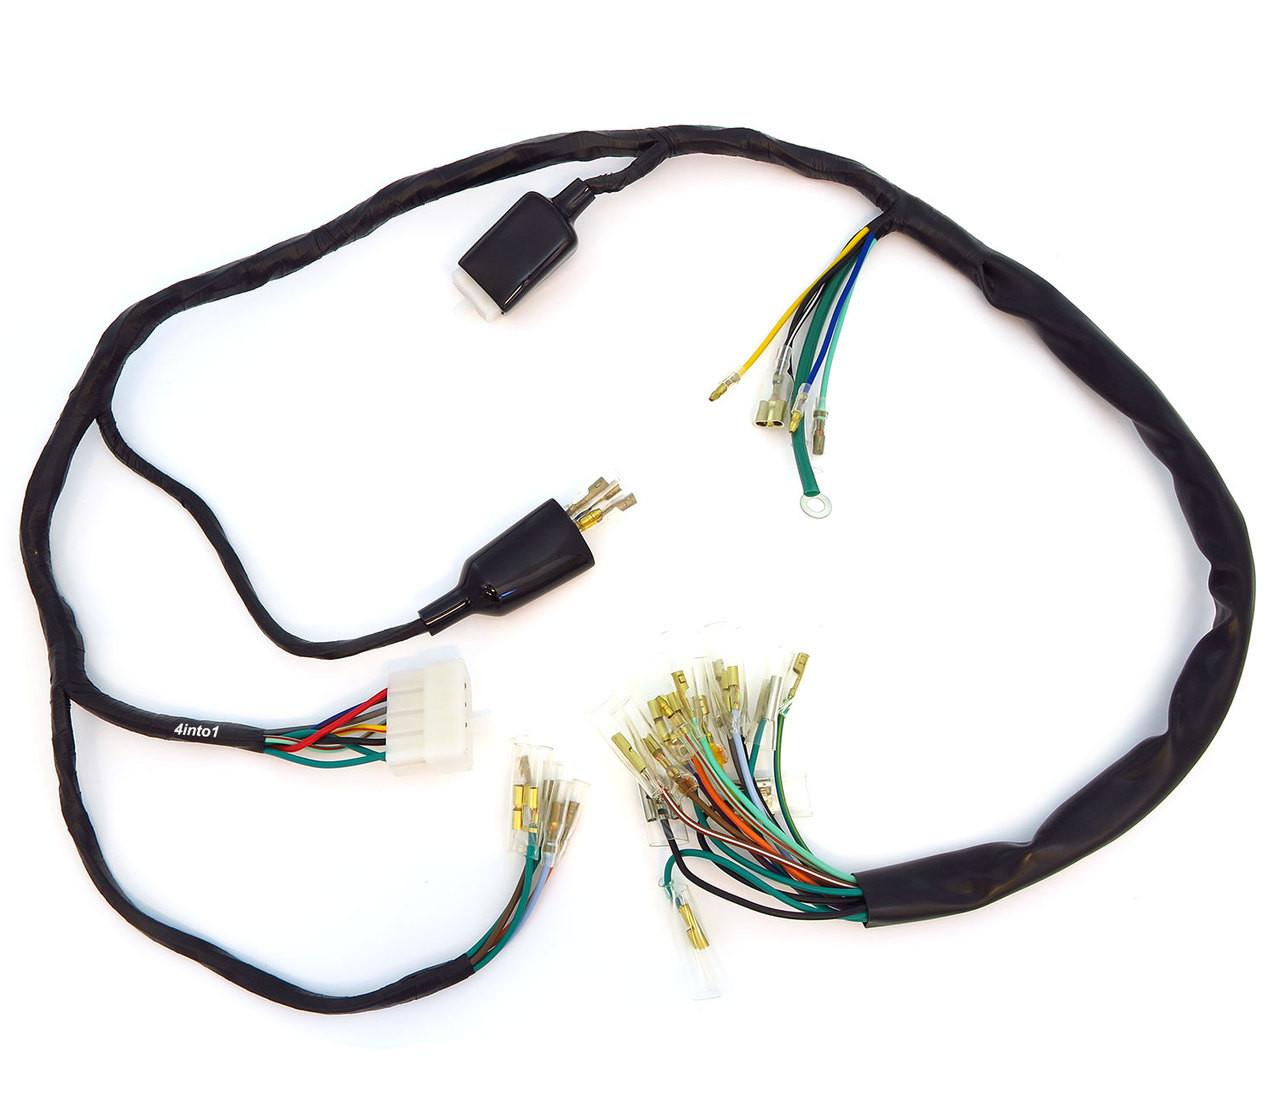 main wiring harness 32100 323 040 honda cb500k 1972 1973 honda ignition coil honda wiring harness [ 1280 x 1113 Pixel ]